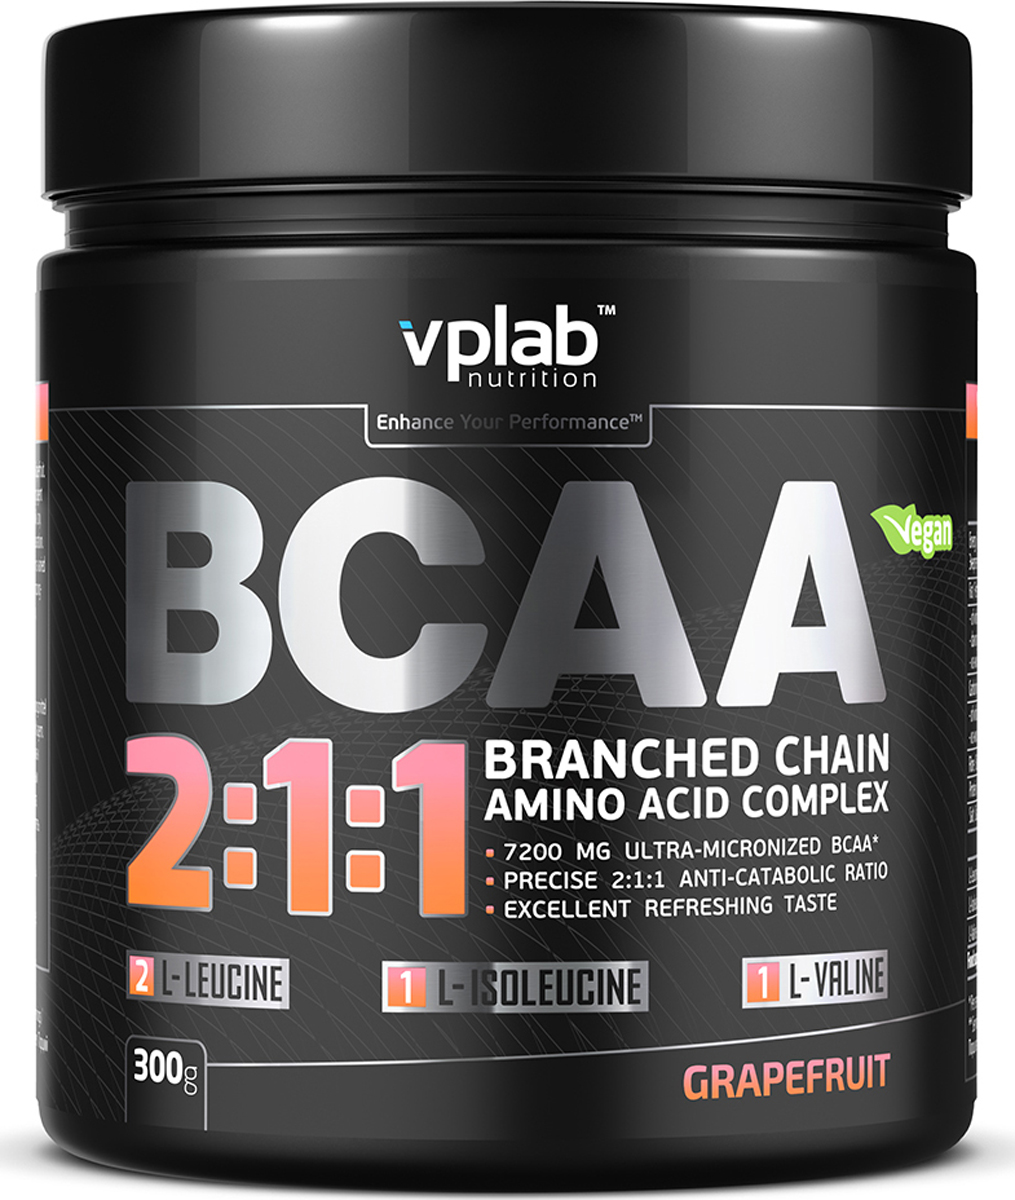 "Аминокислотный комплекс Vplab ""BCAA 2:1:1"", грейпфрут, 300 г, VPLAB Nutrition"